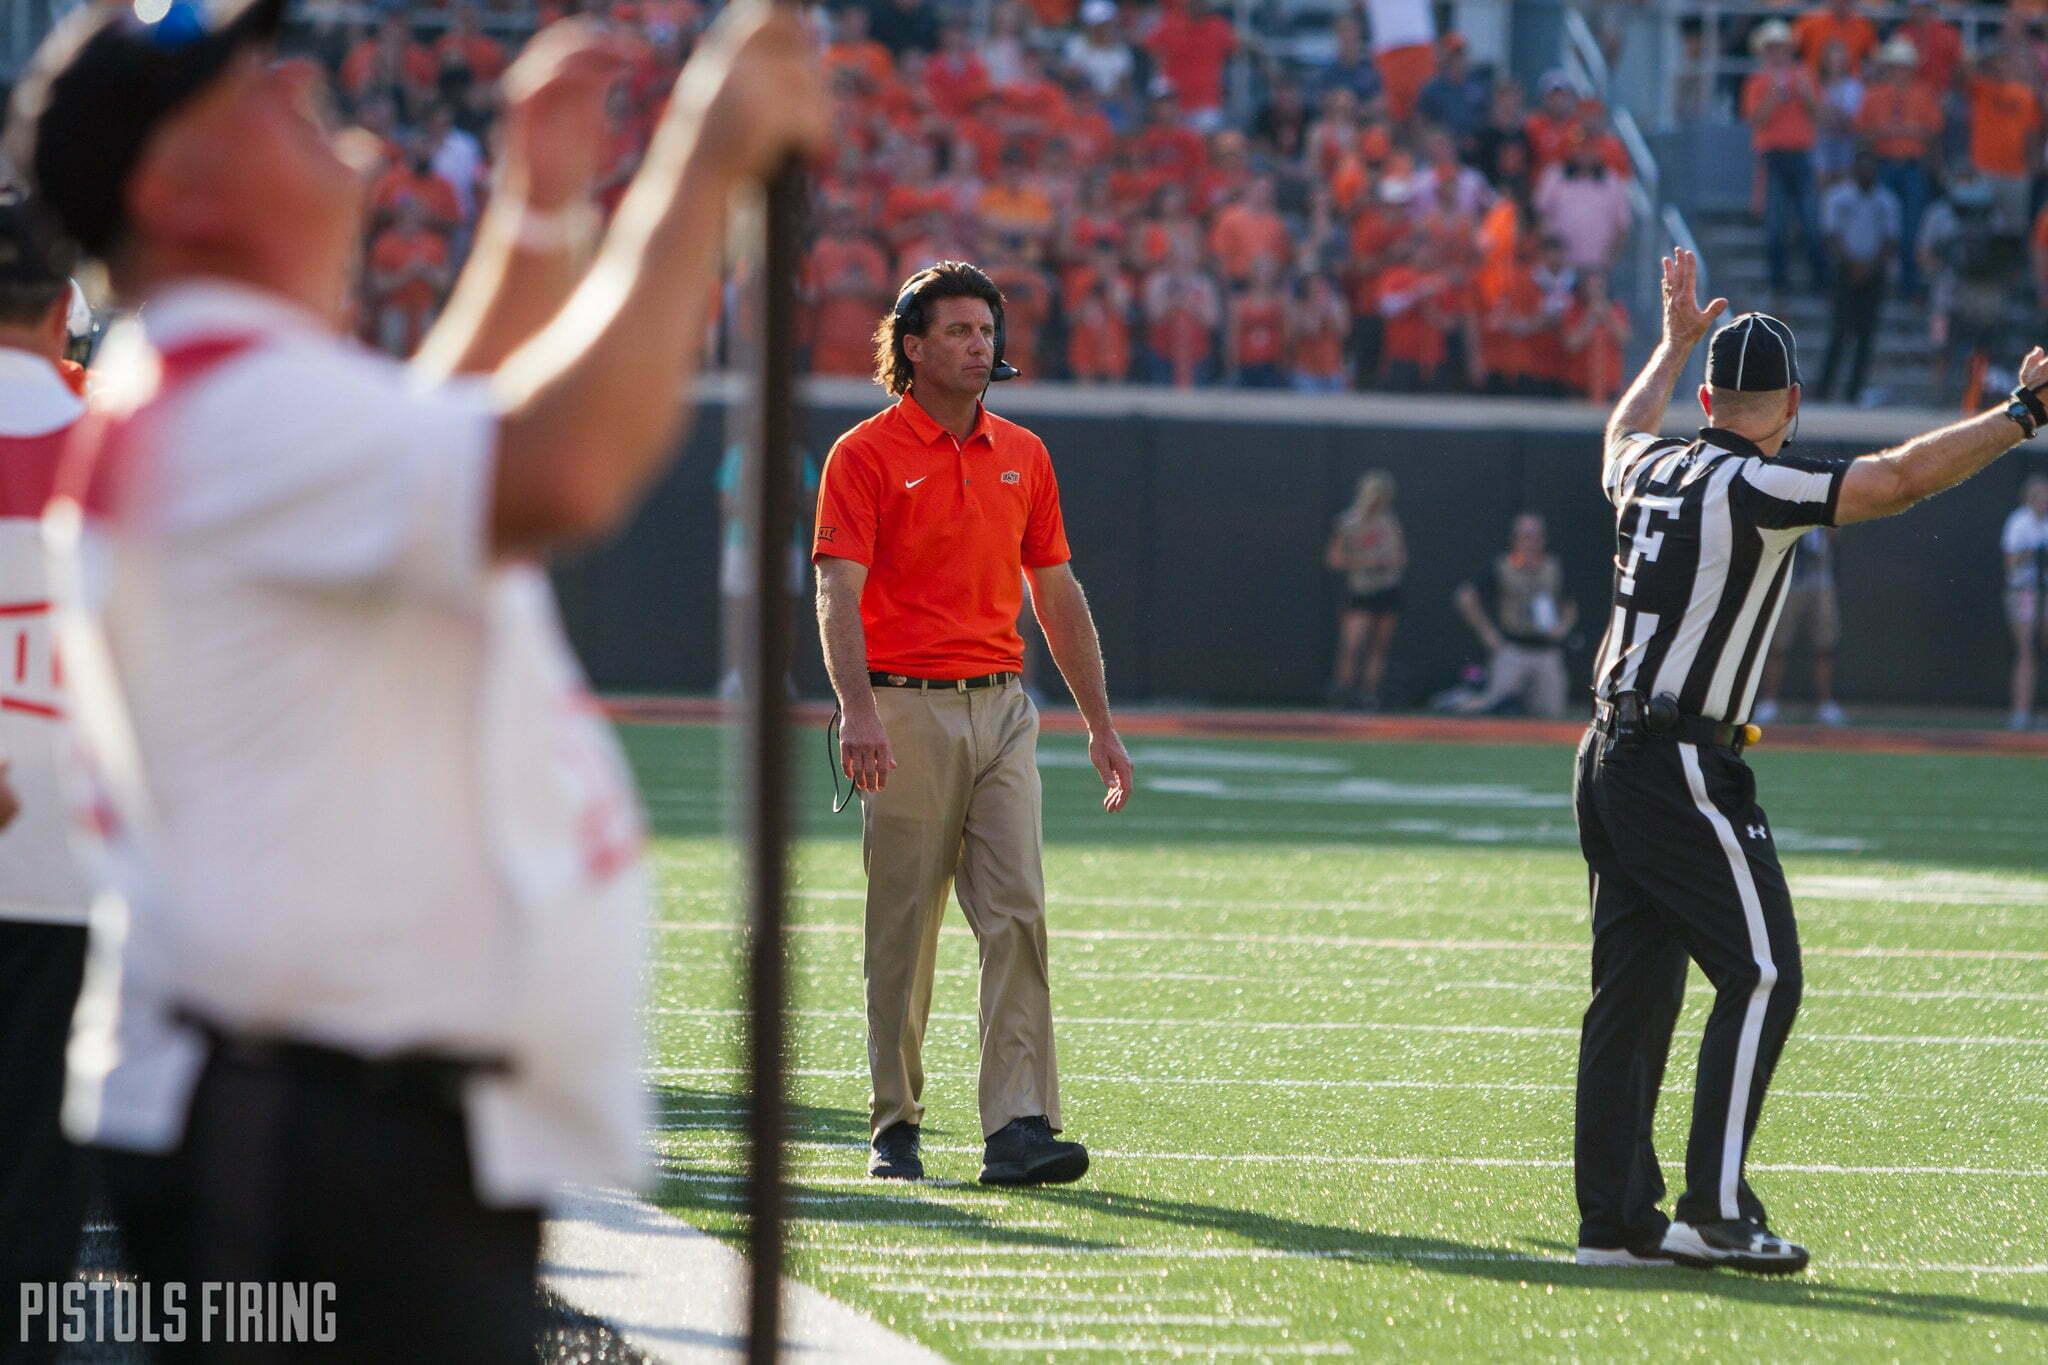 FSU, Michigan, USC All Among Favorites to Land Mike Gundy In 2020   Pistols Firing